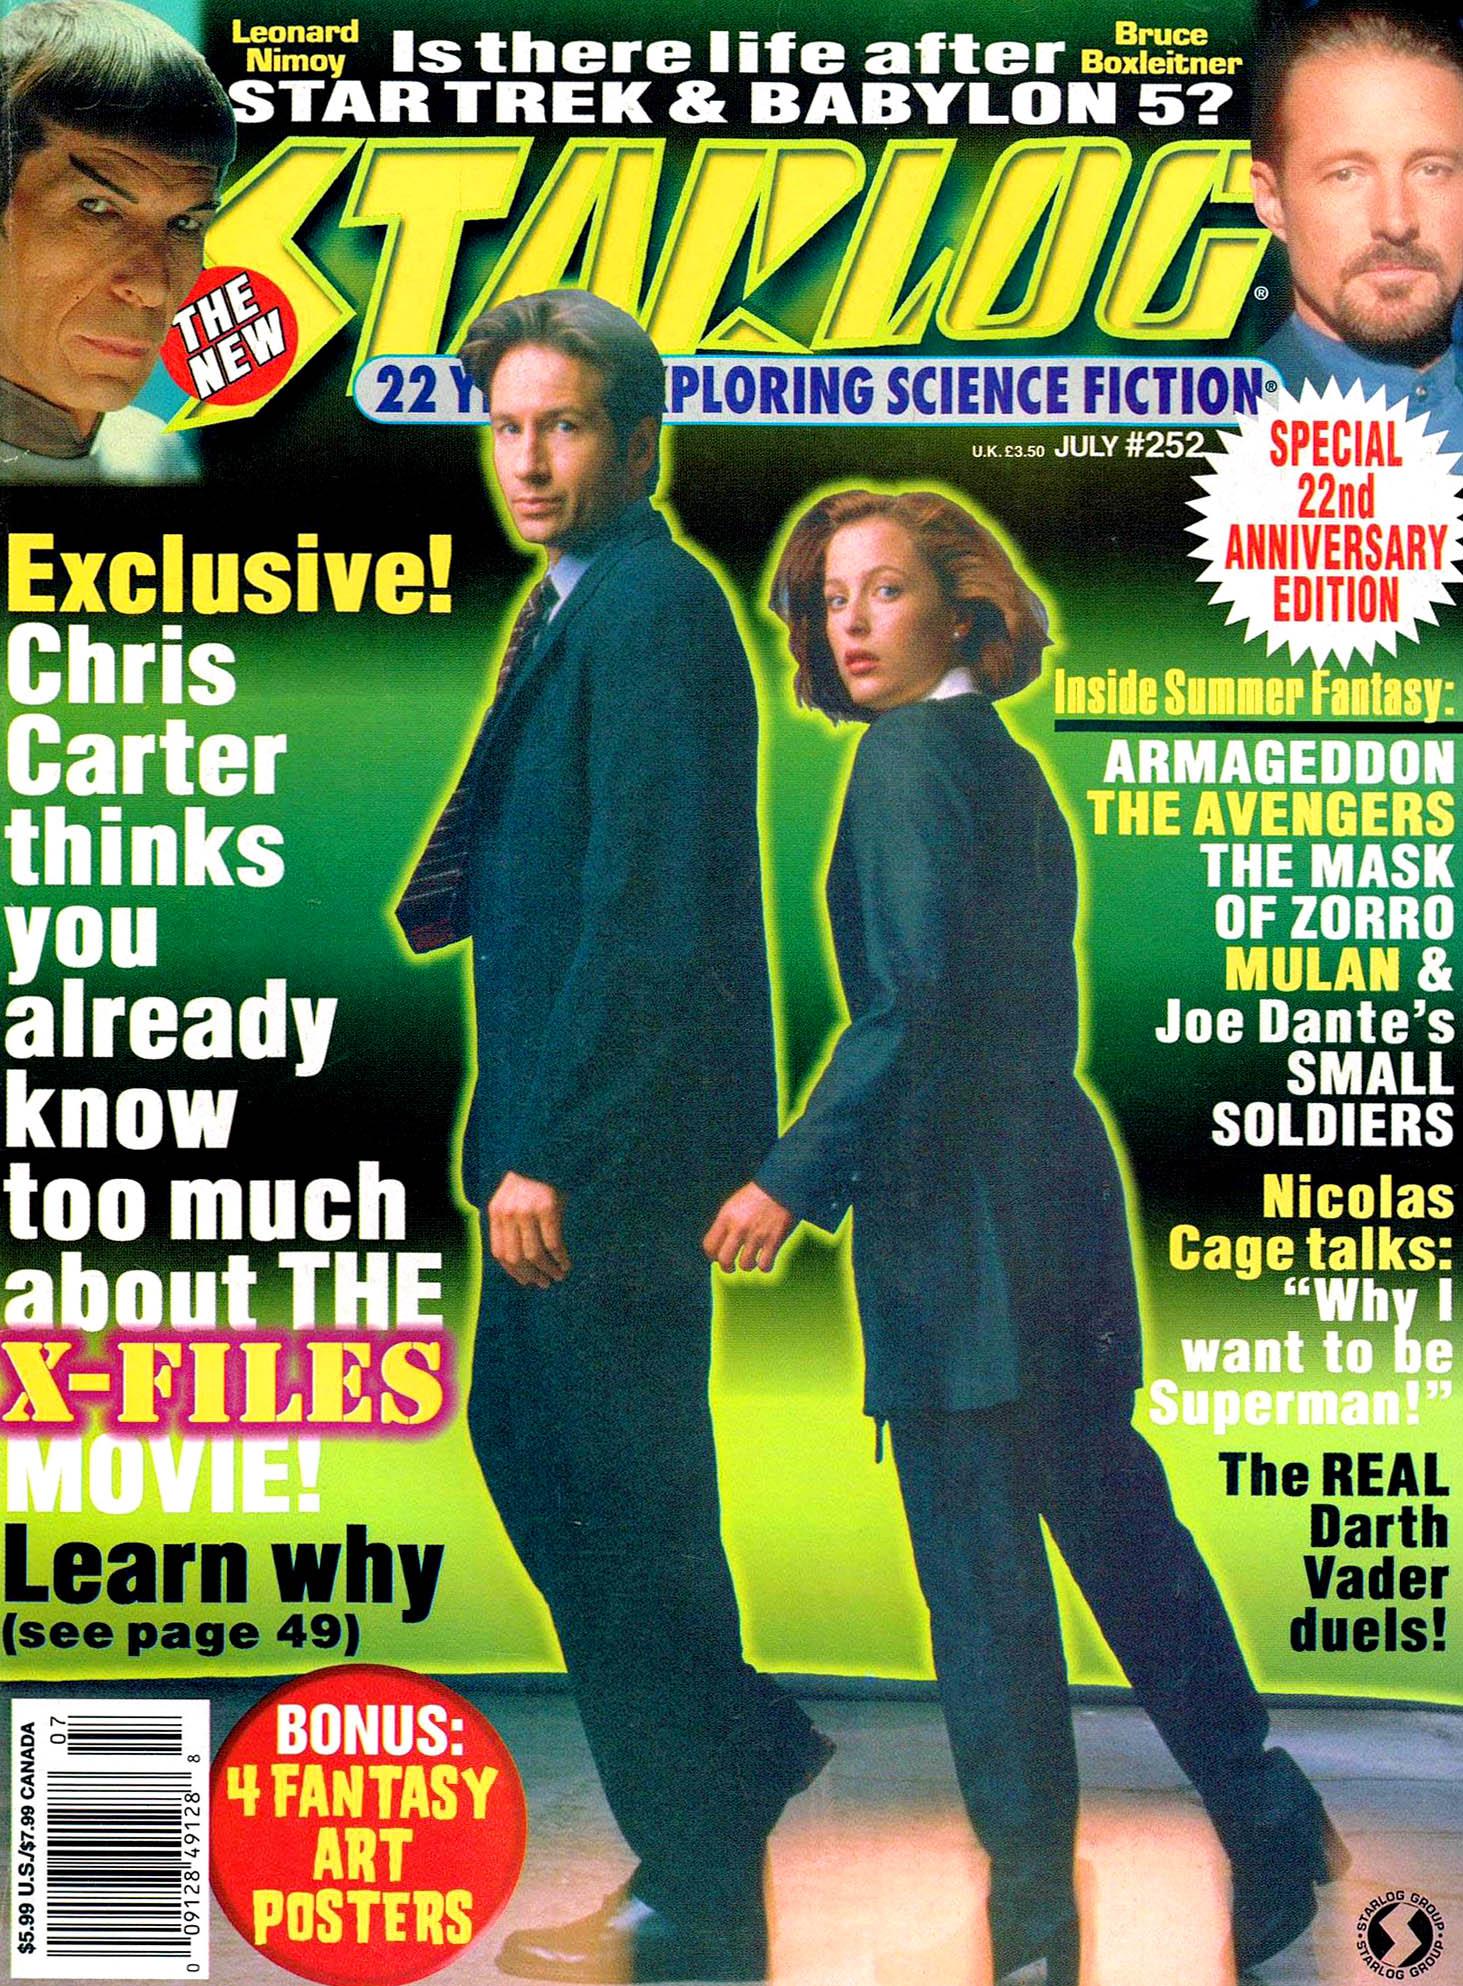 Starlog 252 1998 07 X-Files-1.jpg